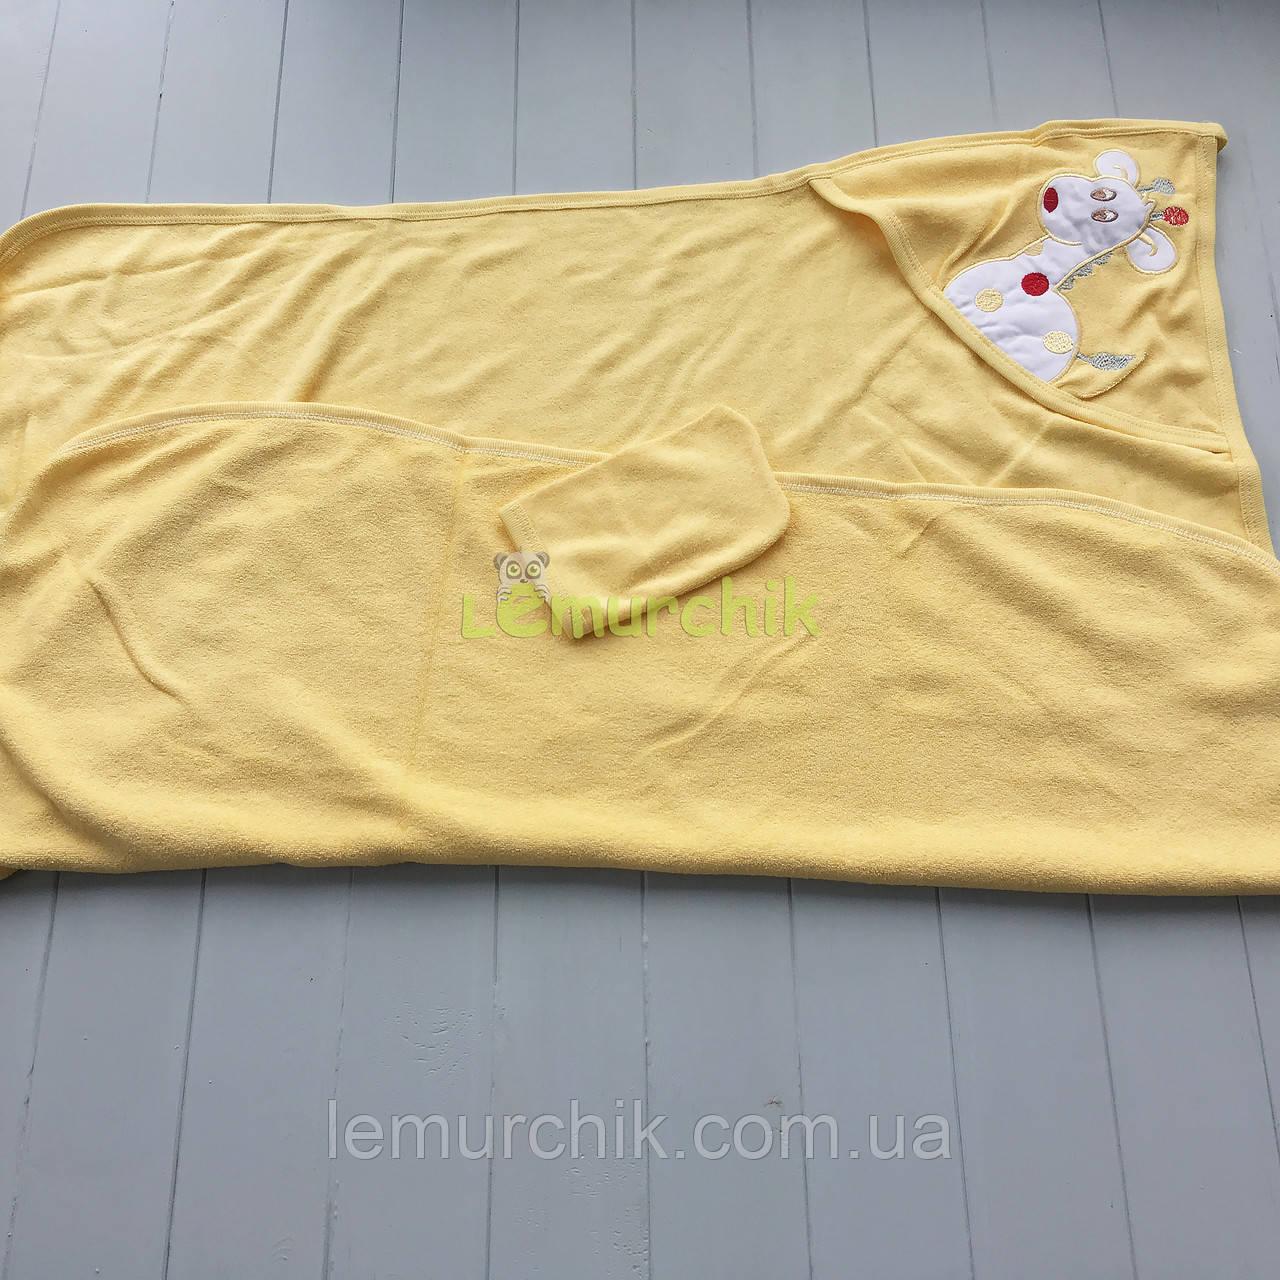 Полотенце-уголок с капюшоном пищалкой+варежка Bebellove, желтое